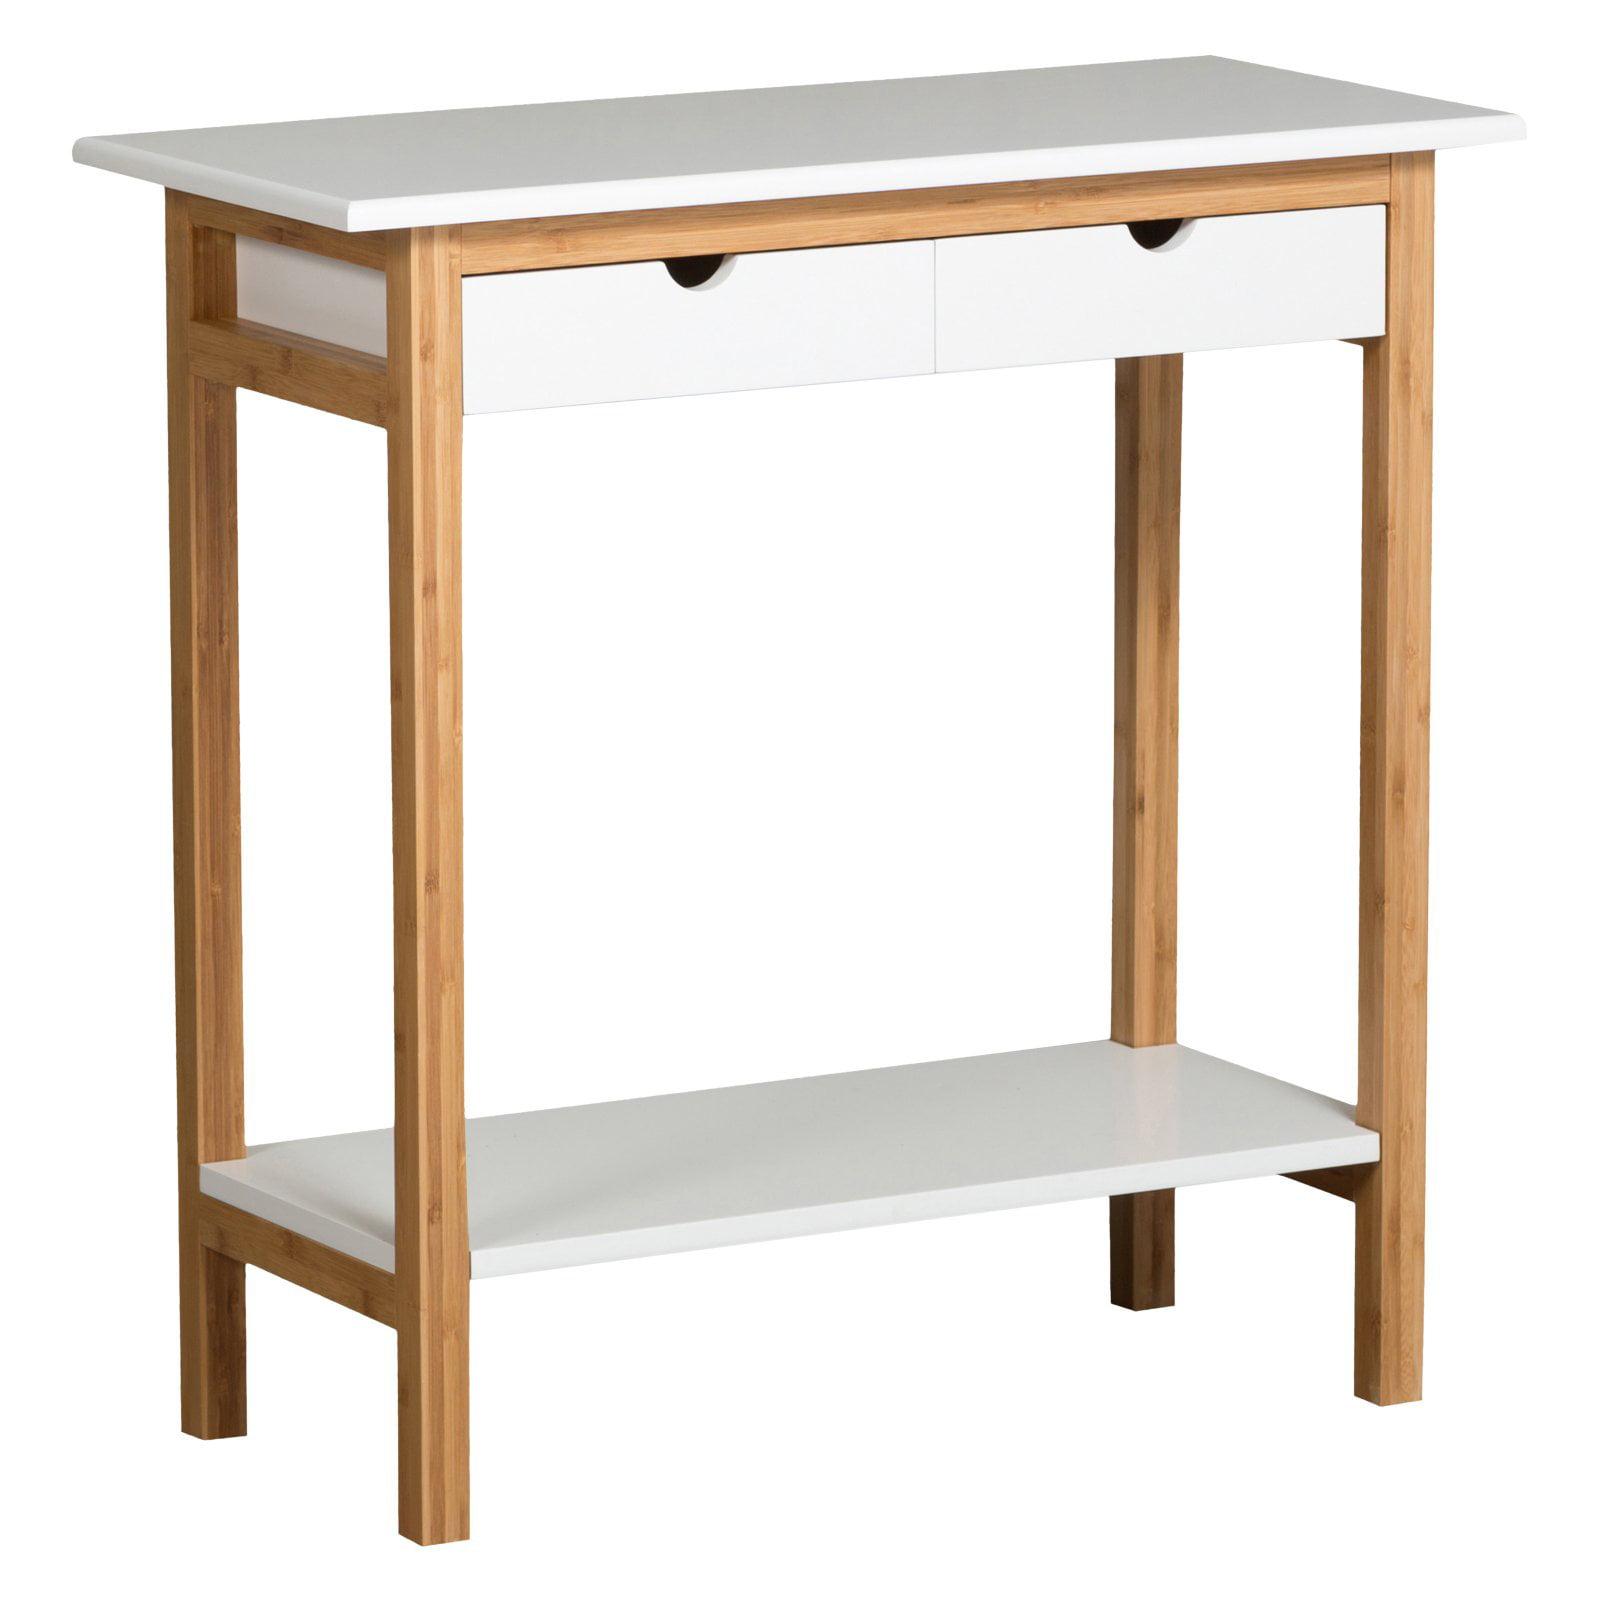 Eccostyle Console Table